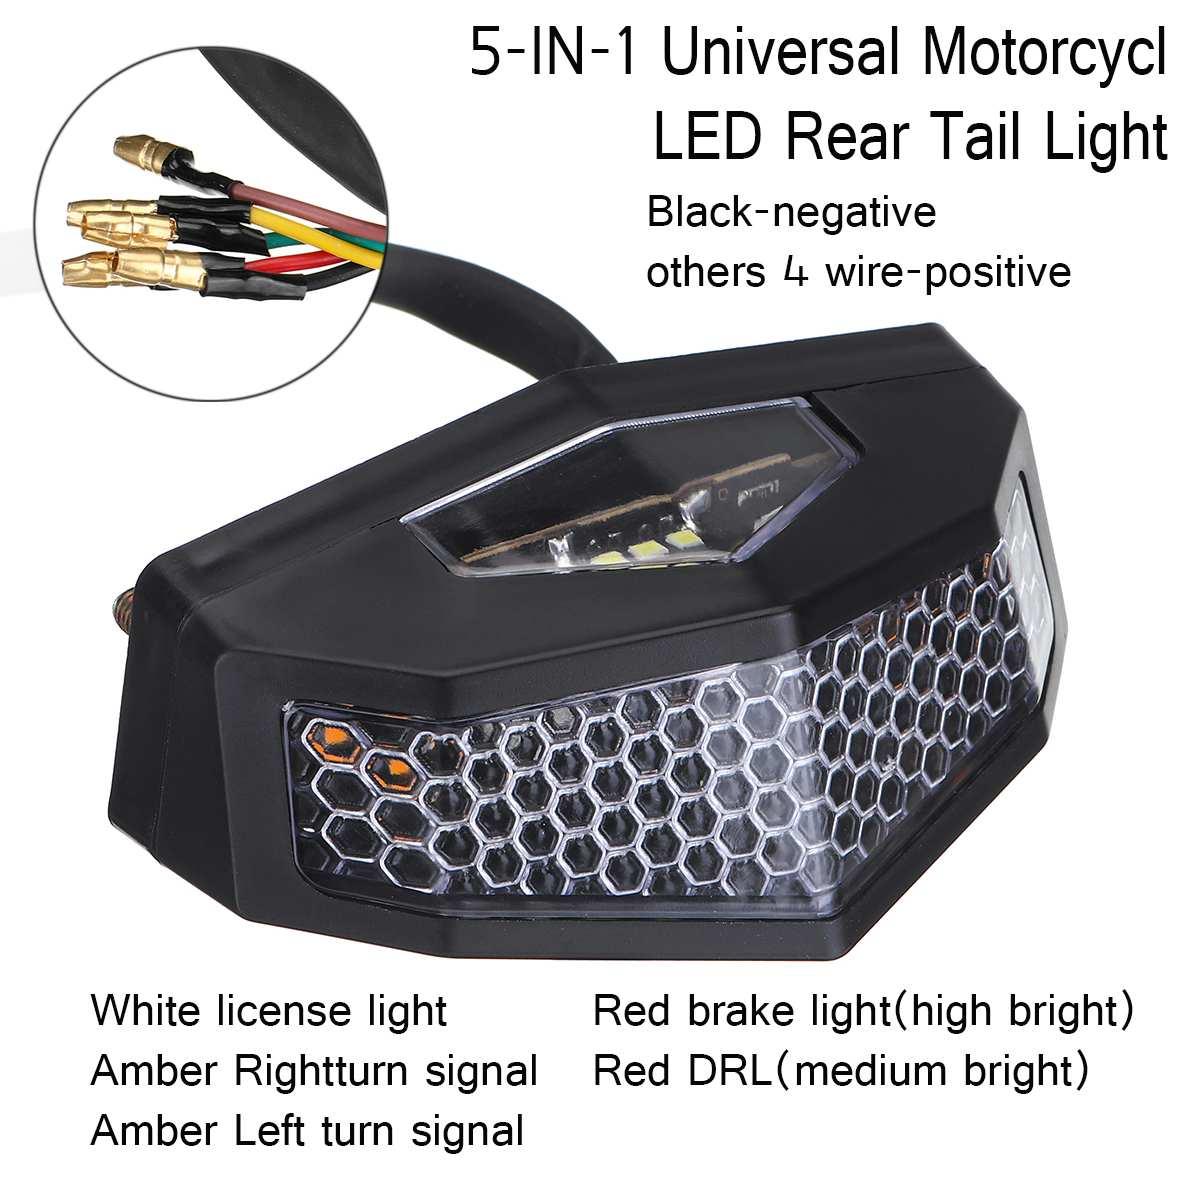 12V 5 In 1 Universal Motorcycle ATV LED Rear Tail Brake Stop Indicator Signal Lamp Turn Signal Light Retro License Plate Light